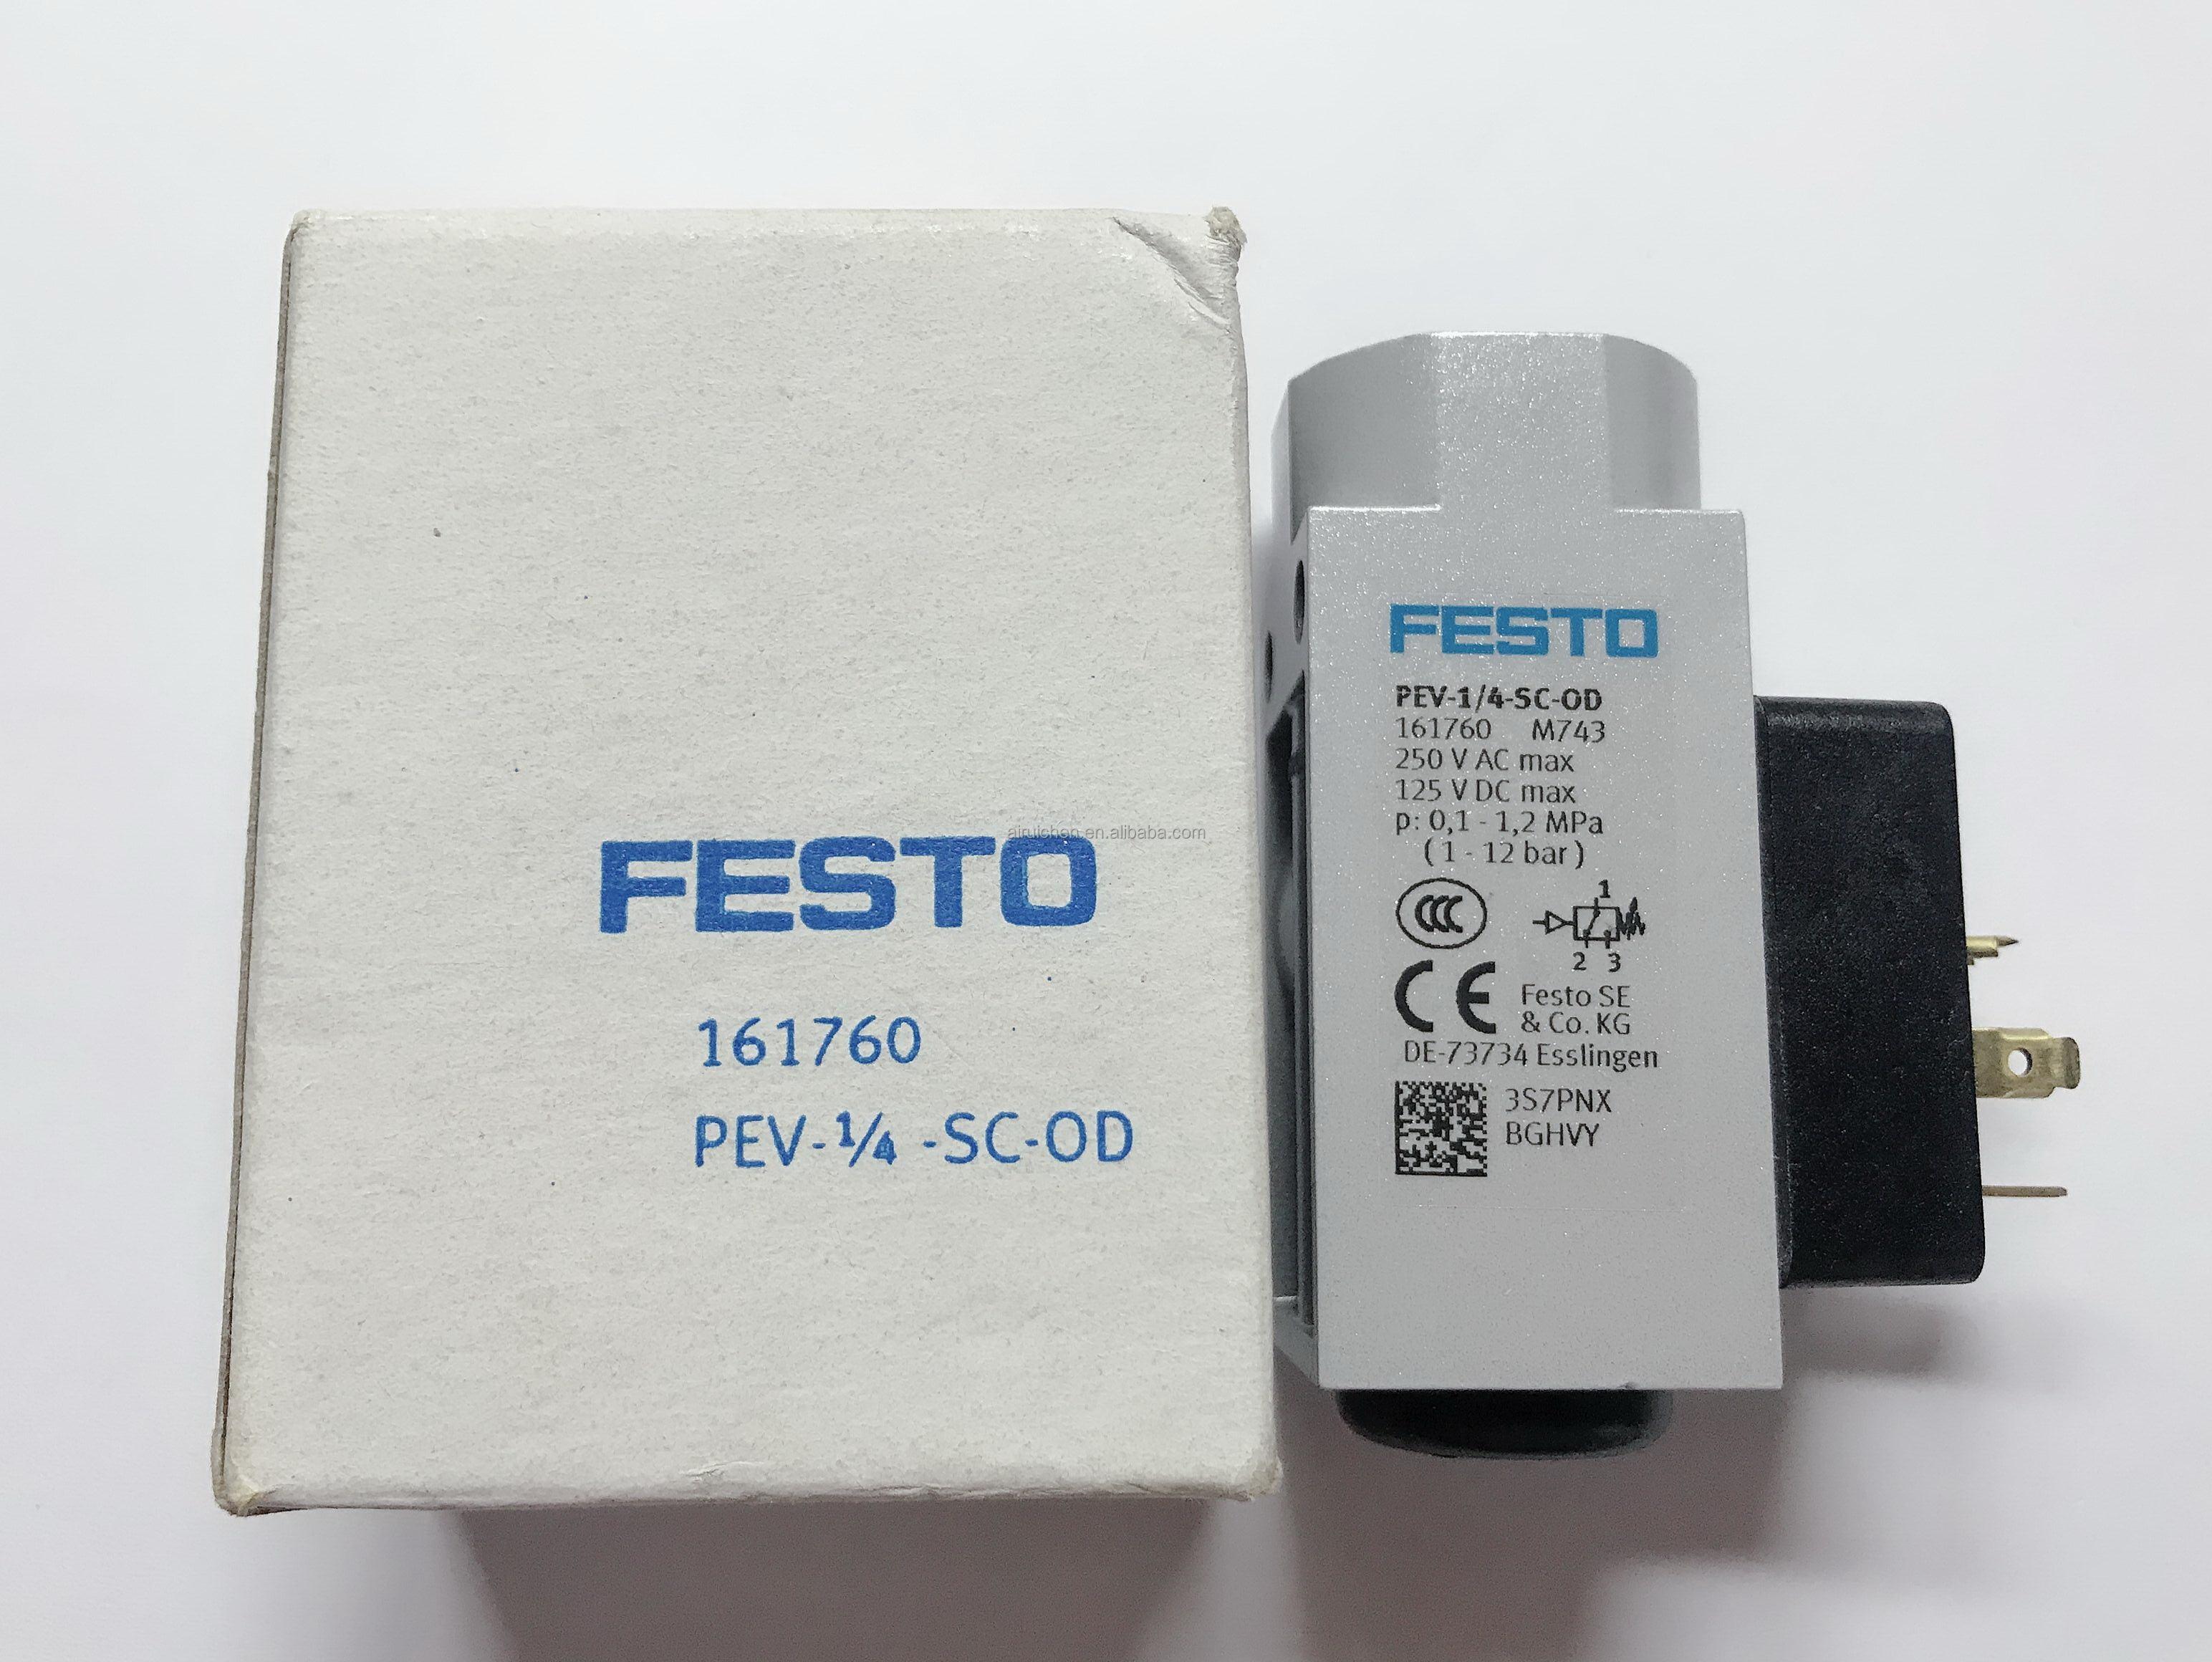 New and original Pneumatic component Tiger Classic valve 9964 MFH-3-1/4 valve for FESTO enlarge